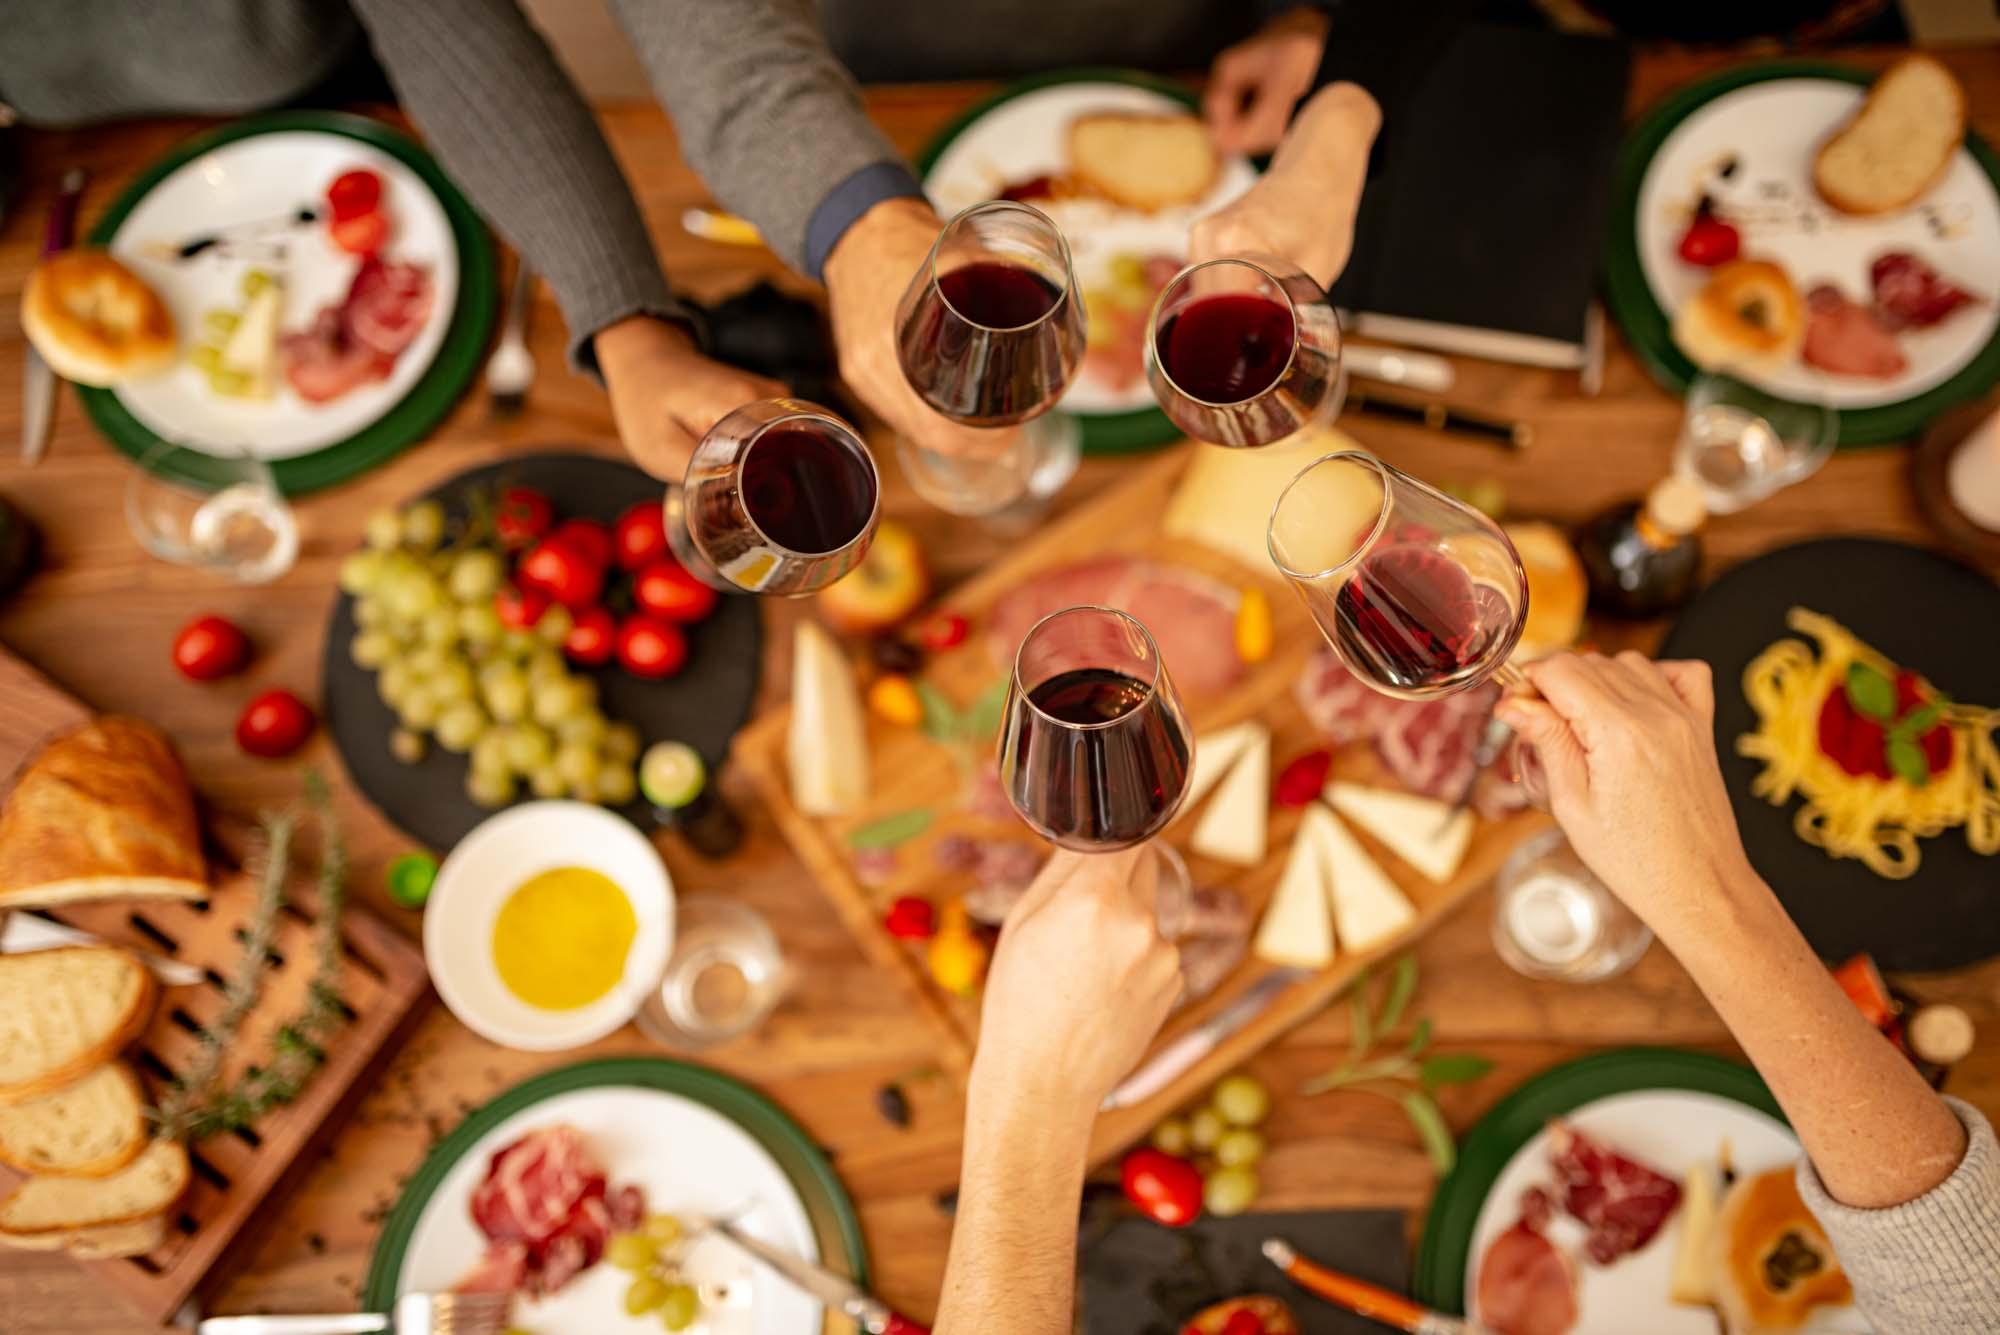 Cucina Amatoriale Formazione Manageriale a Catania